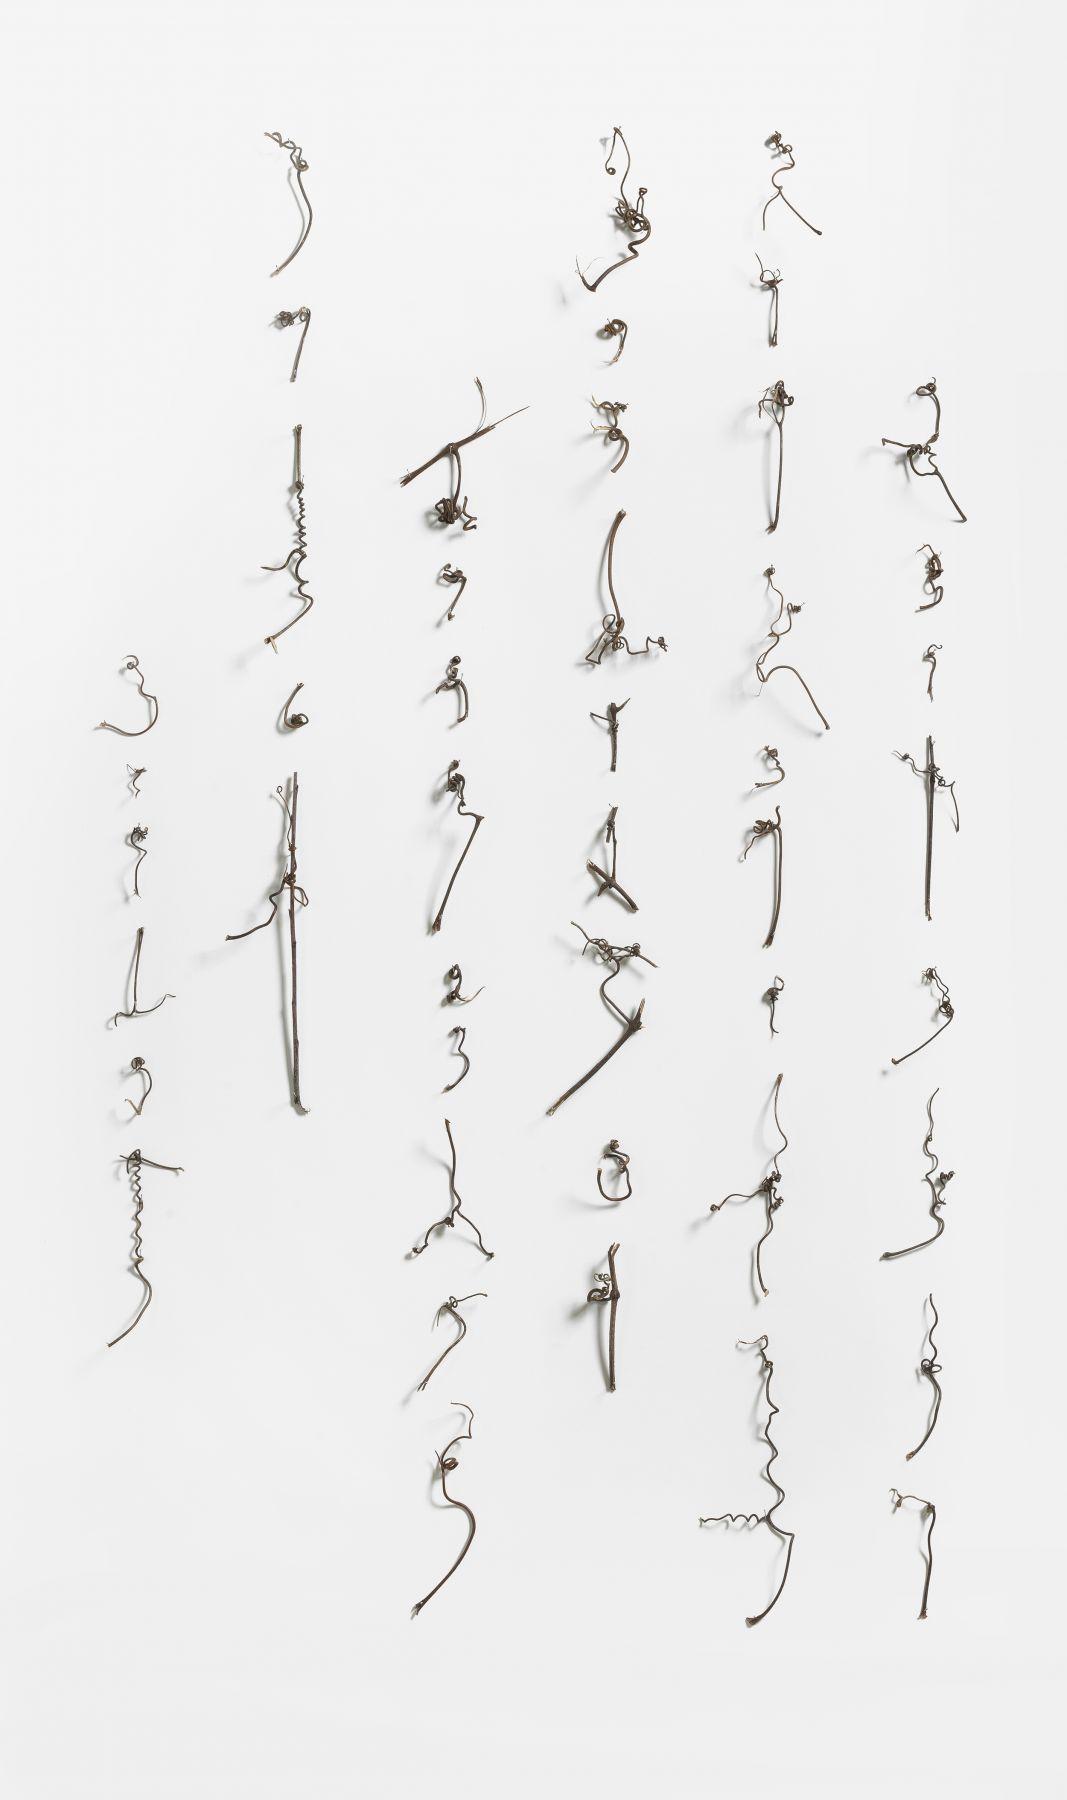 Cui Fei 崔斐 (b. 1970), Manuscript of Nature V_006 5 自然的手稿之五(006) 5